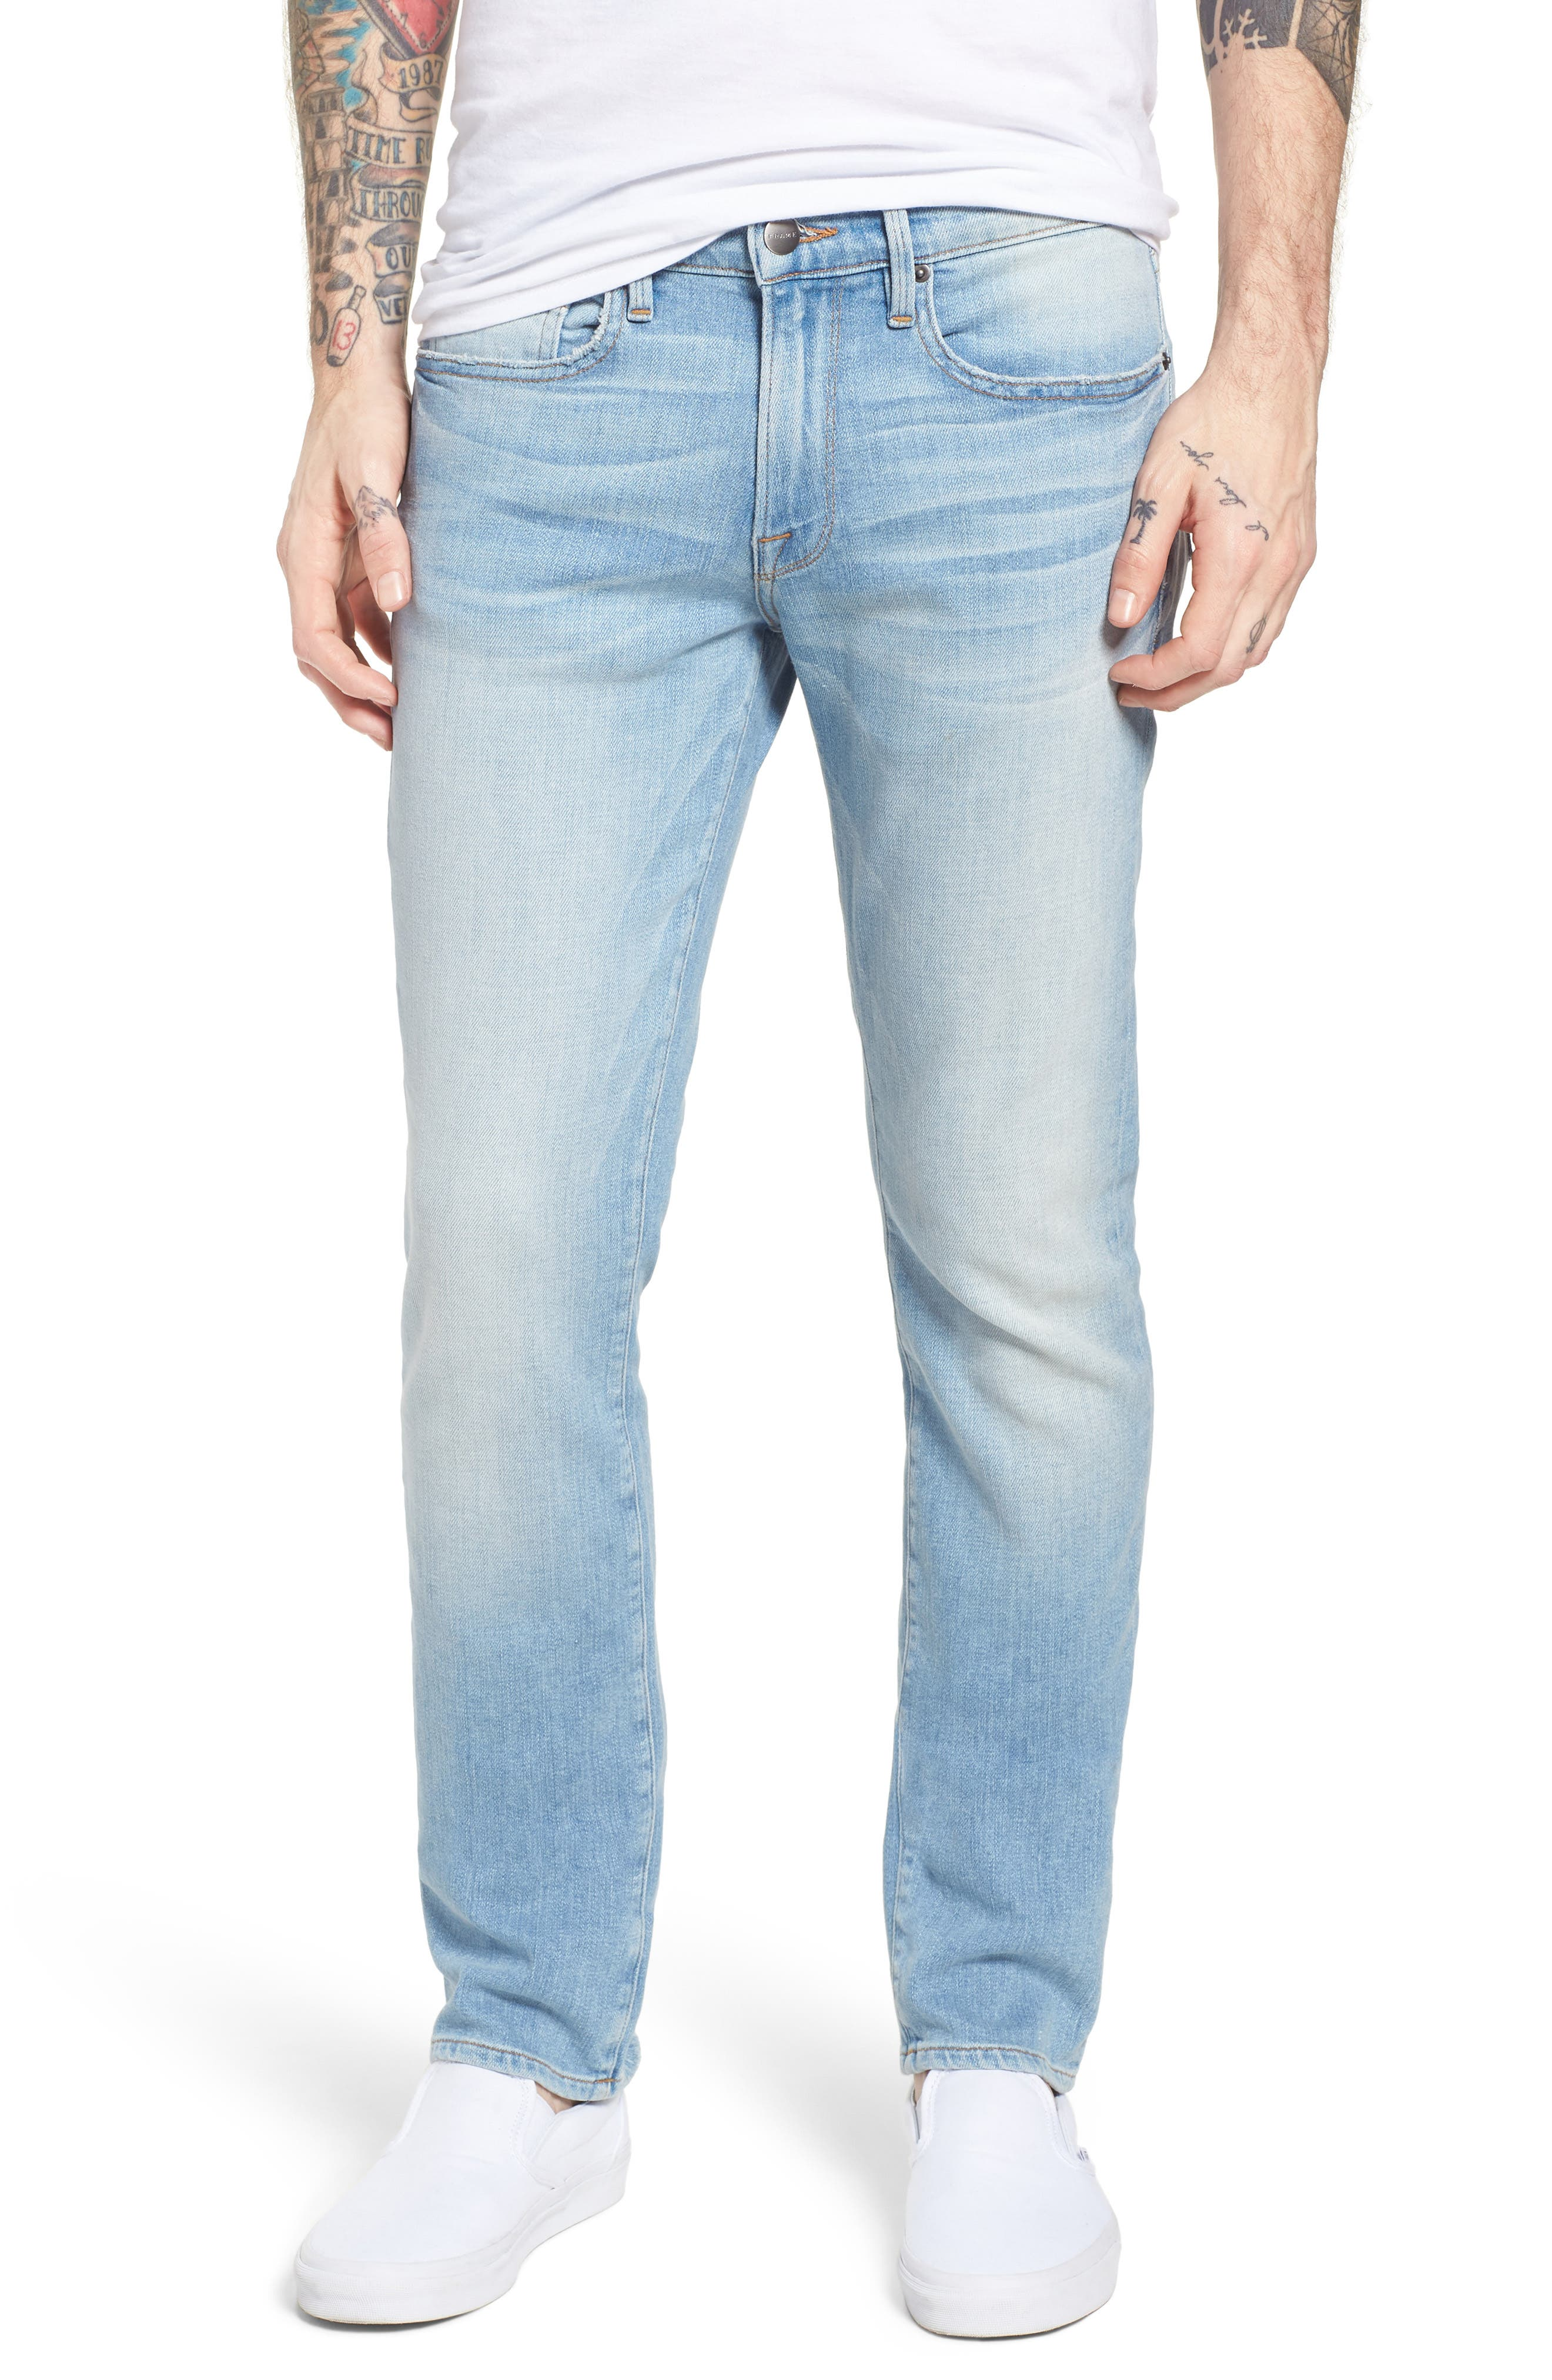 L'Homme Straight Leg Jeans,                         Main,                         color, Finn